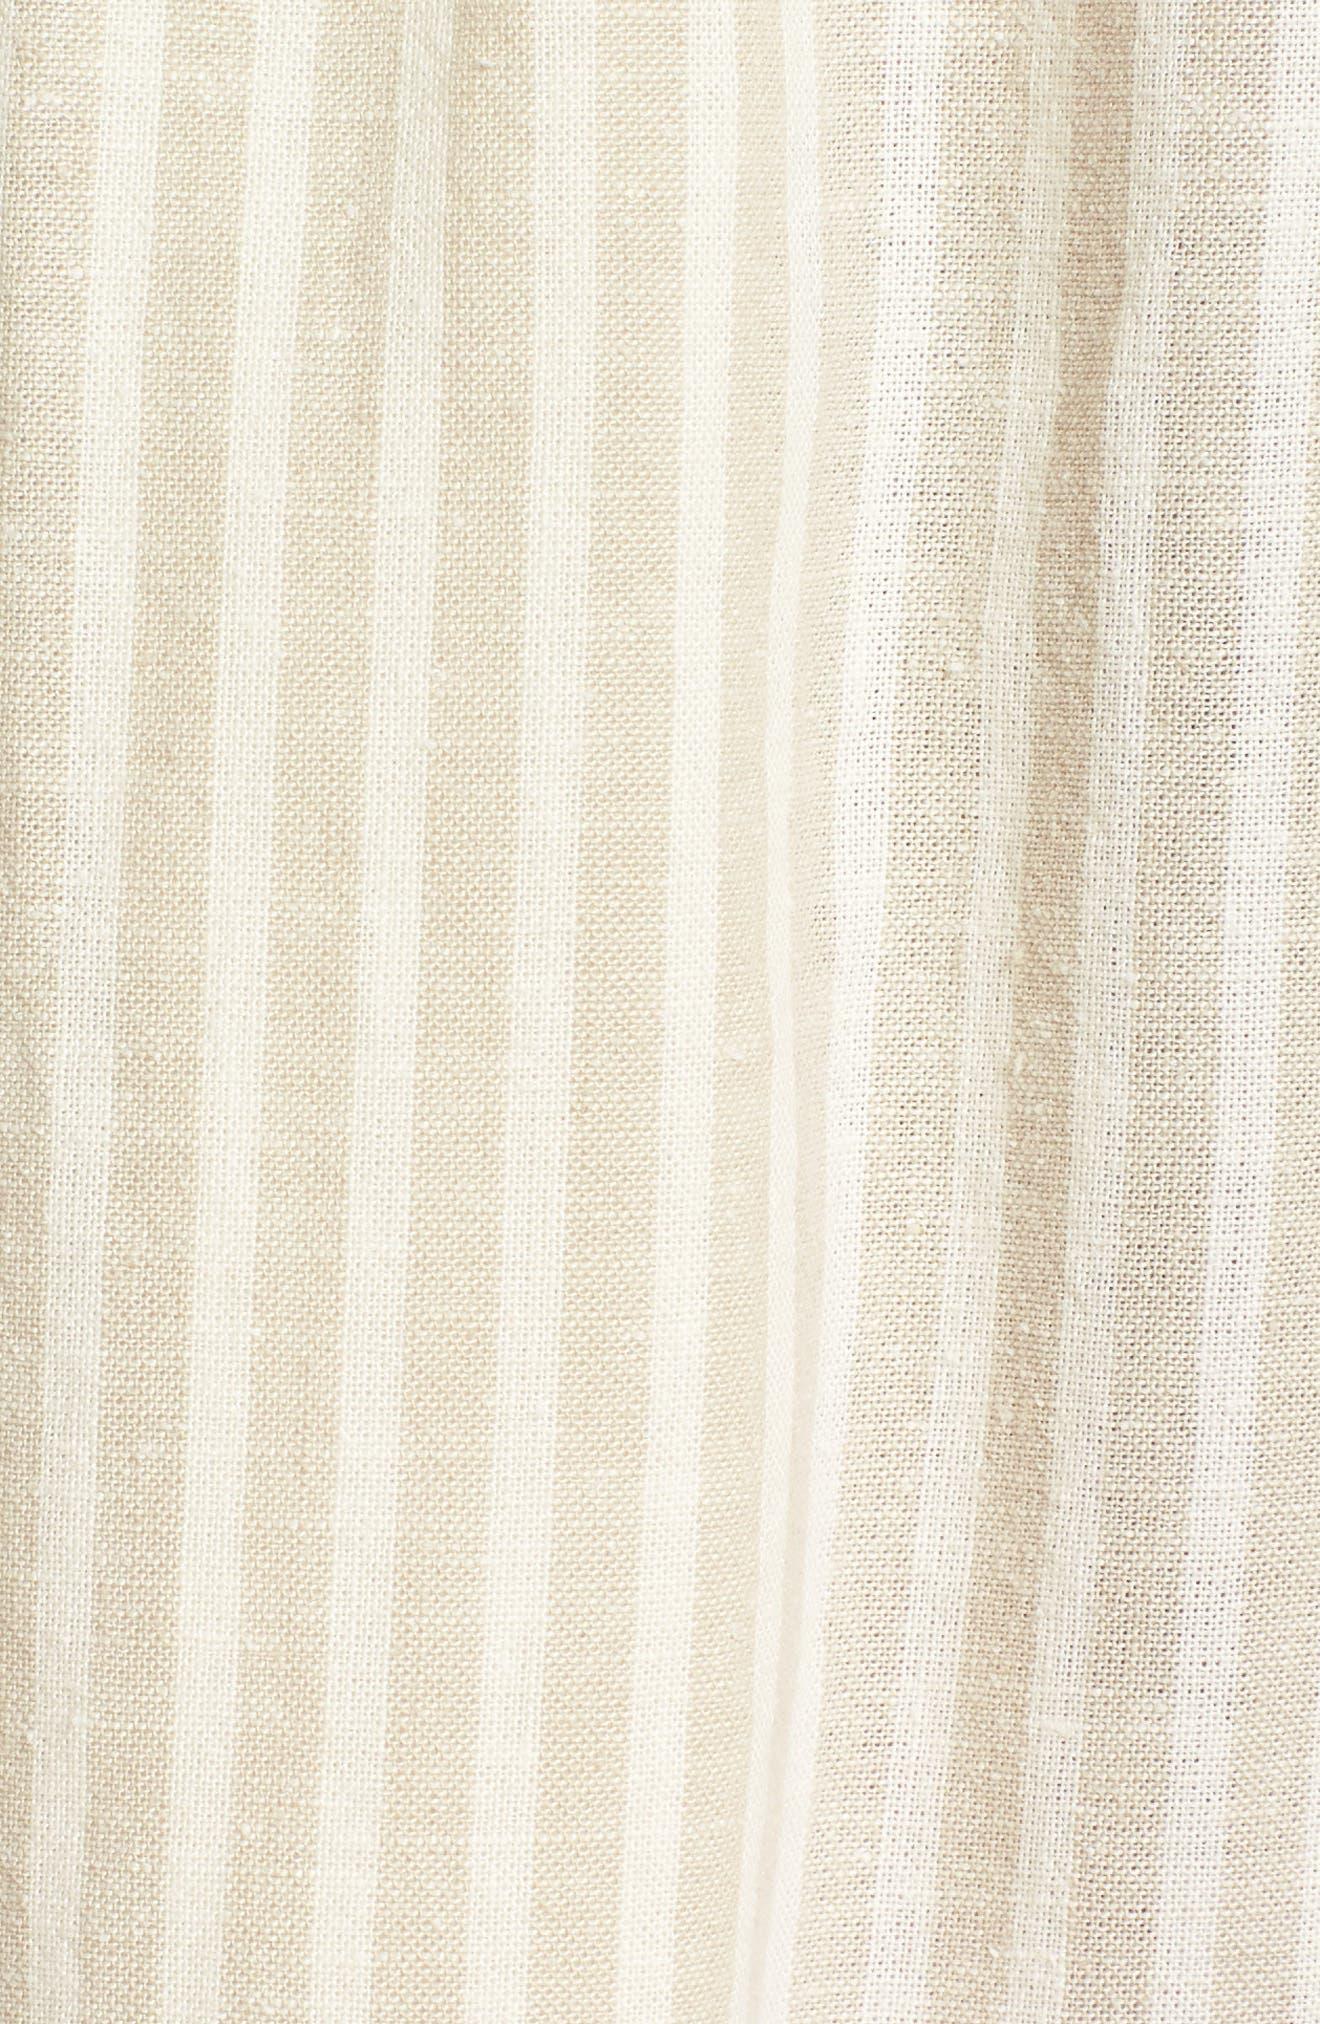 EILEEN FISHER,                             Stripe Hemp & Organic Cotton Midi Skirt,                             Alternate thumbnail 5, color,                             257